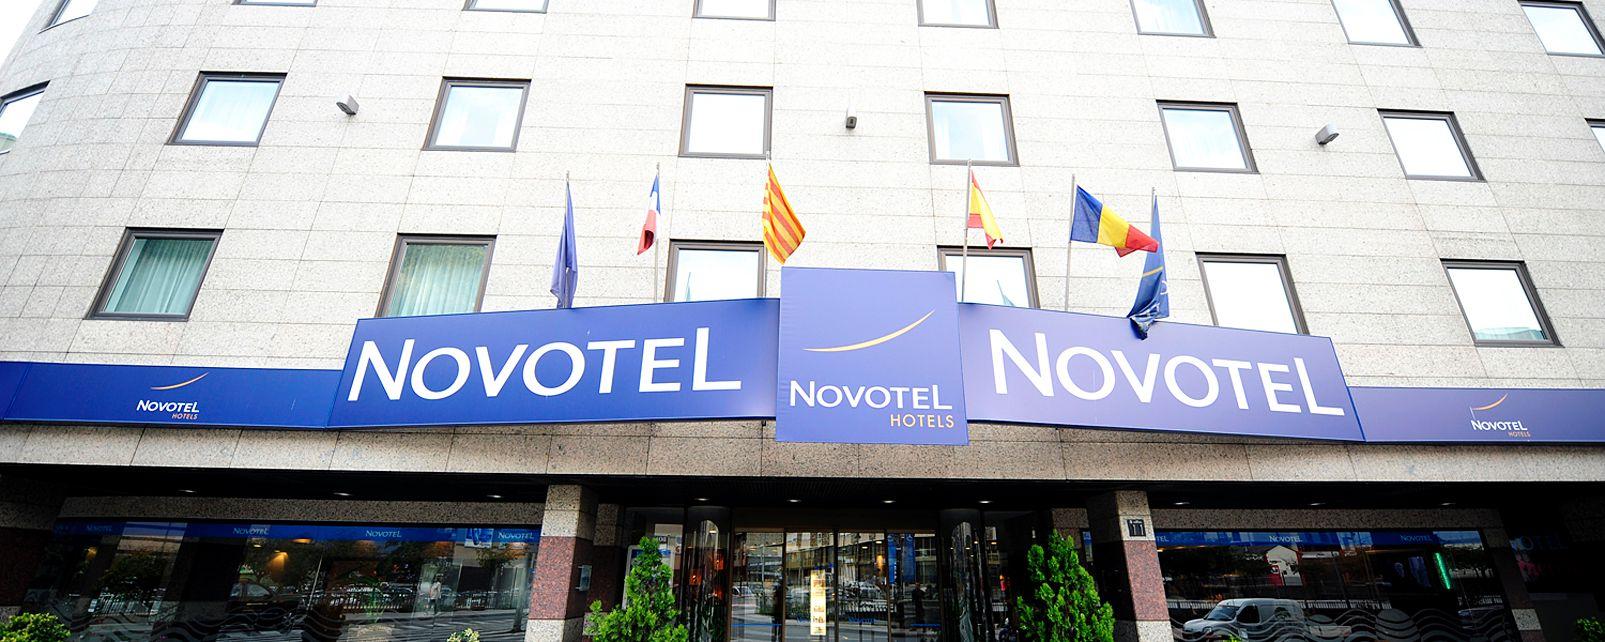 Hôtel Novotel Andorra